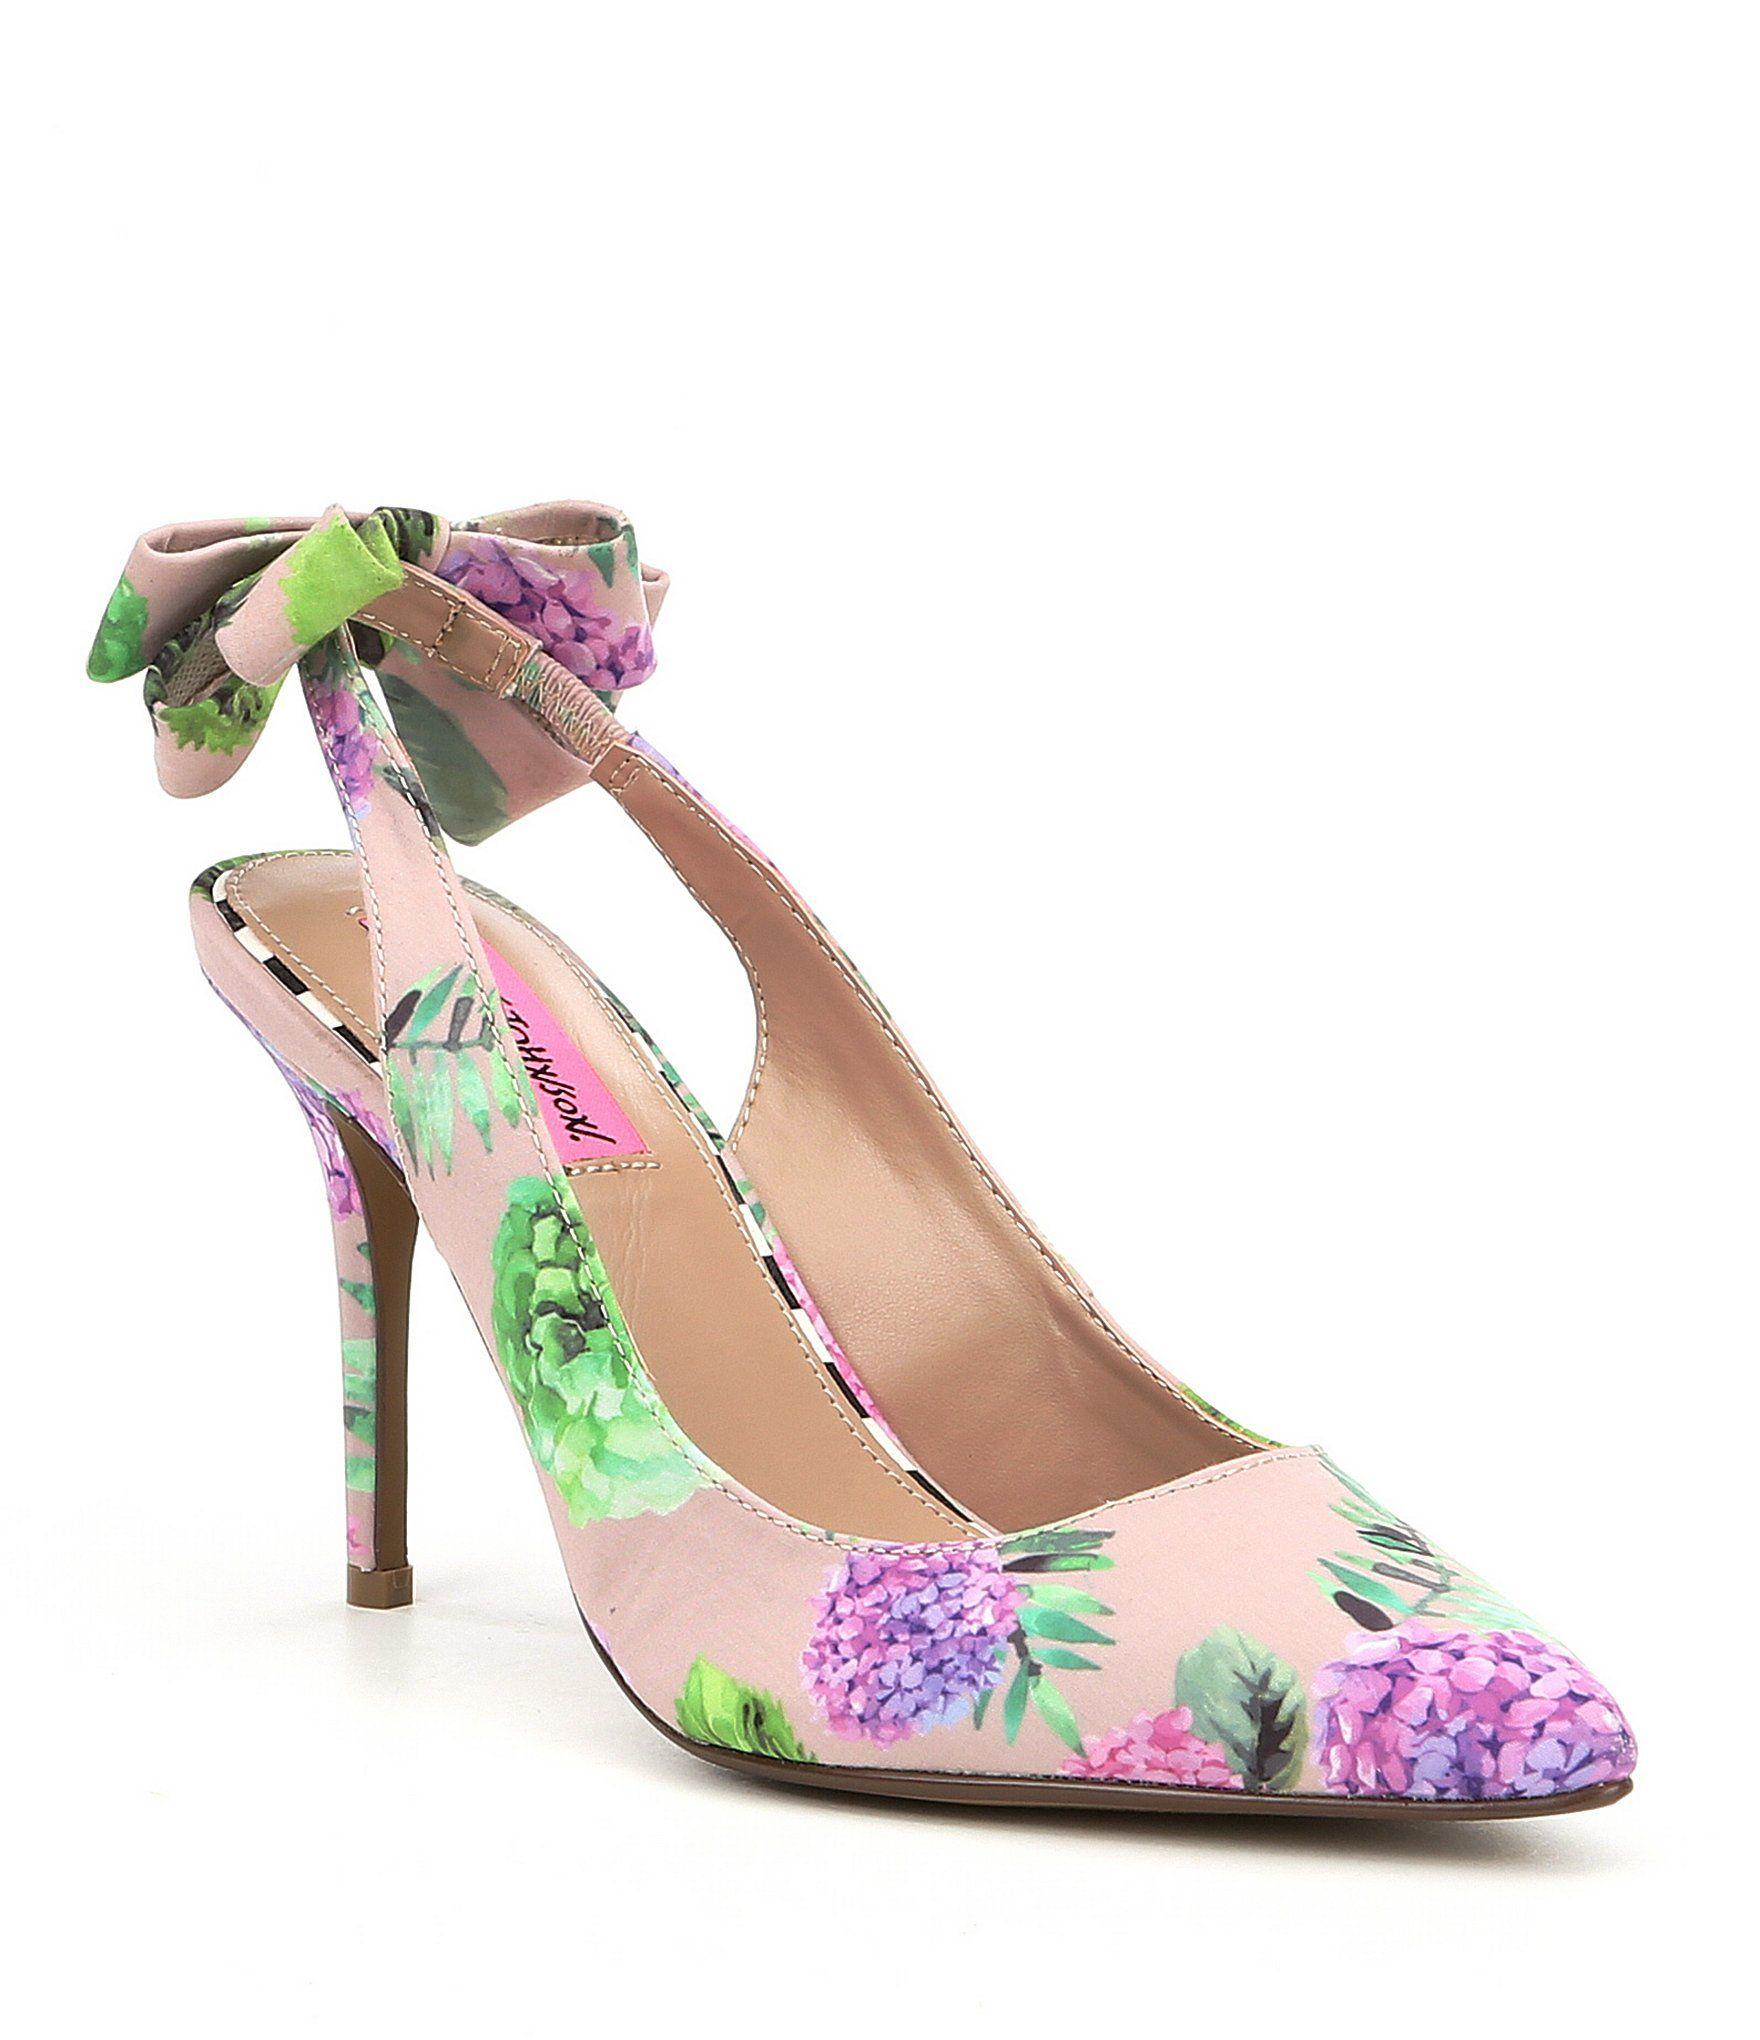 Betsey johnson ginjer satin floral bow sling back pumps